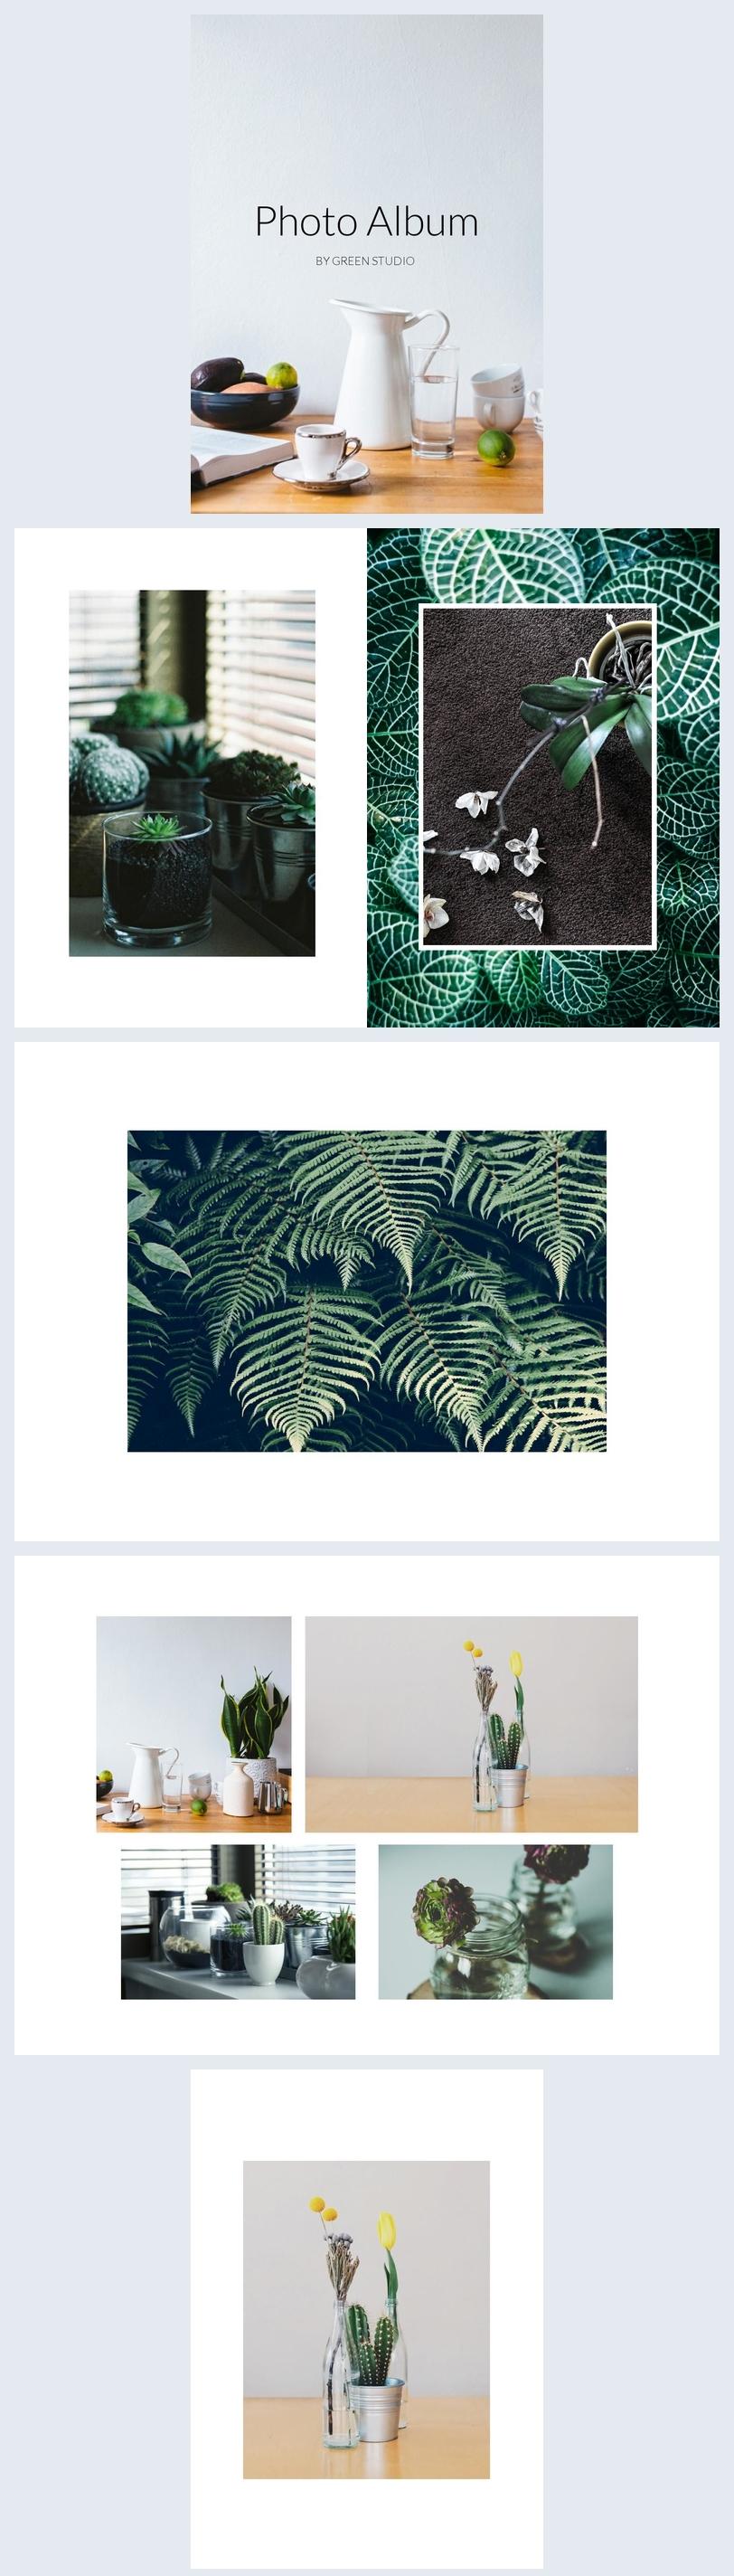 Diseño para álbum fotográfico en línea